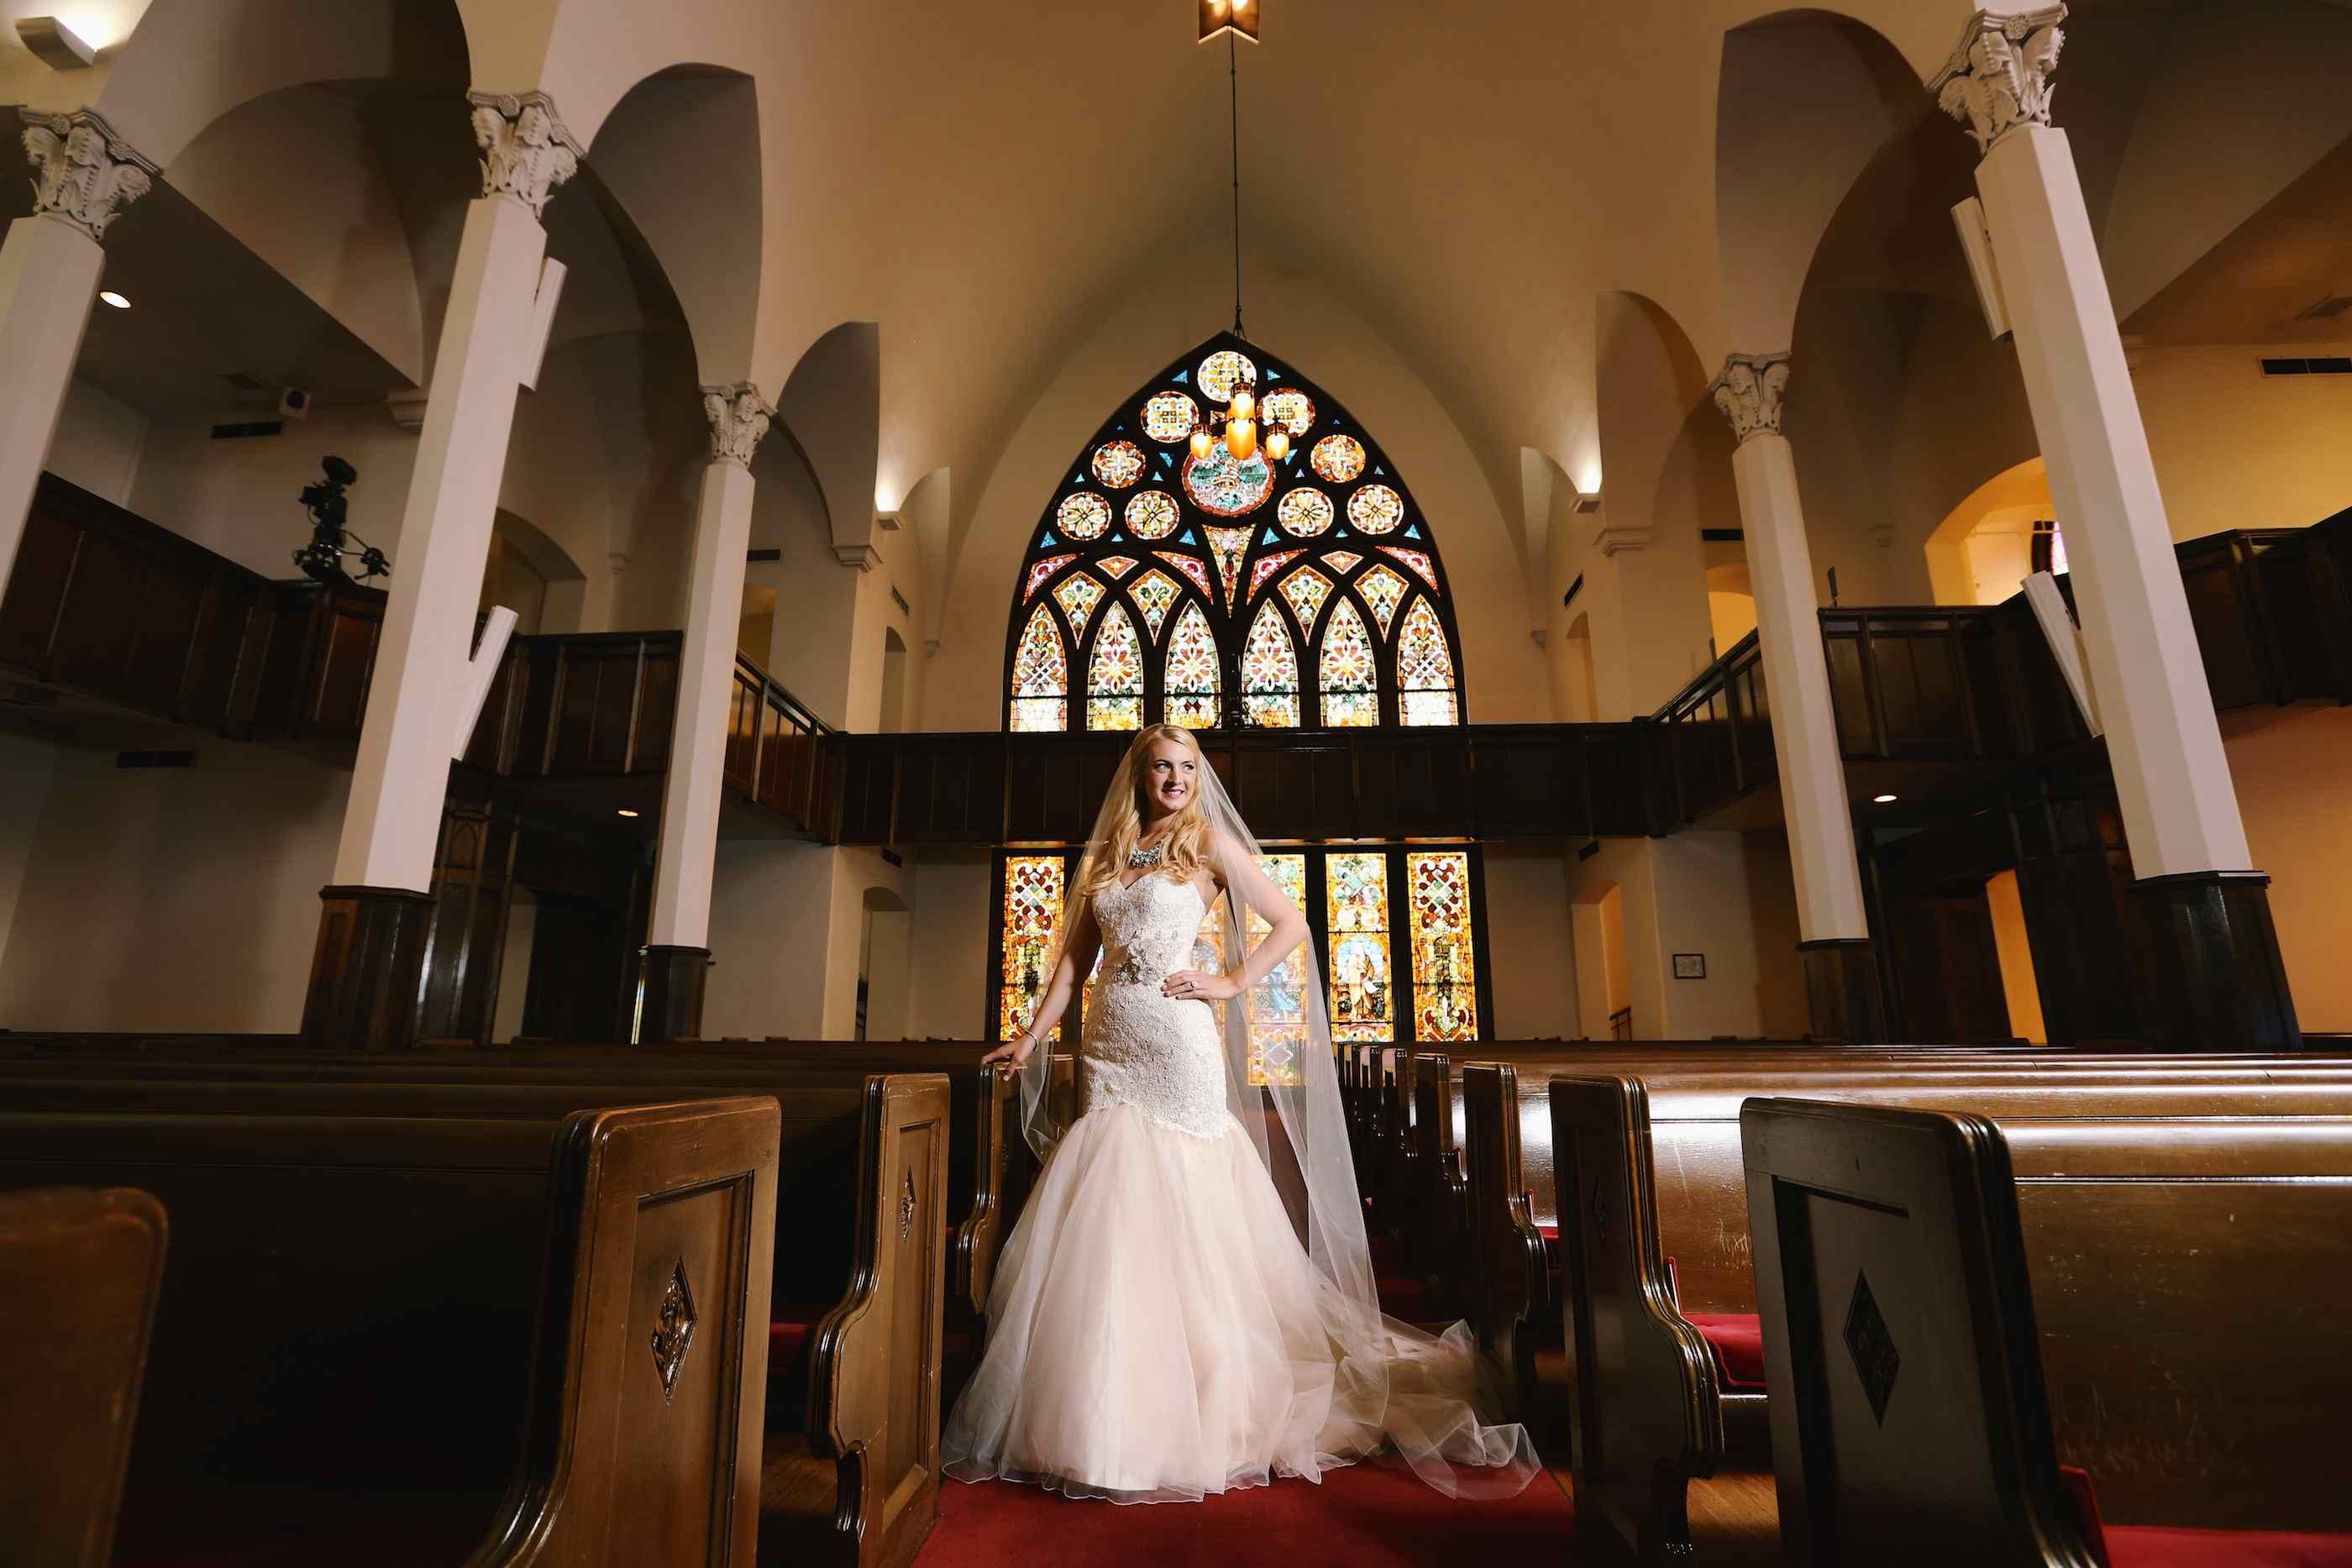 top-10-bride-photos-2013-007